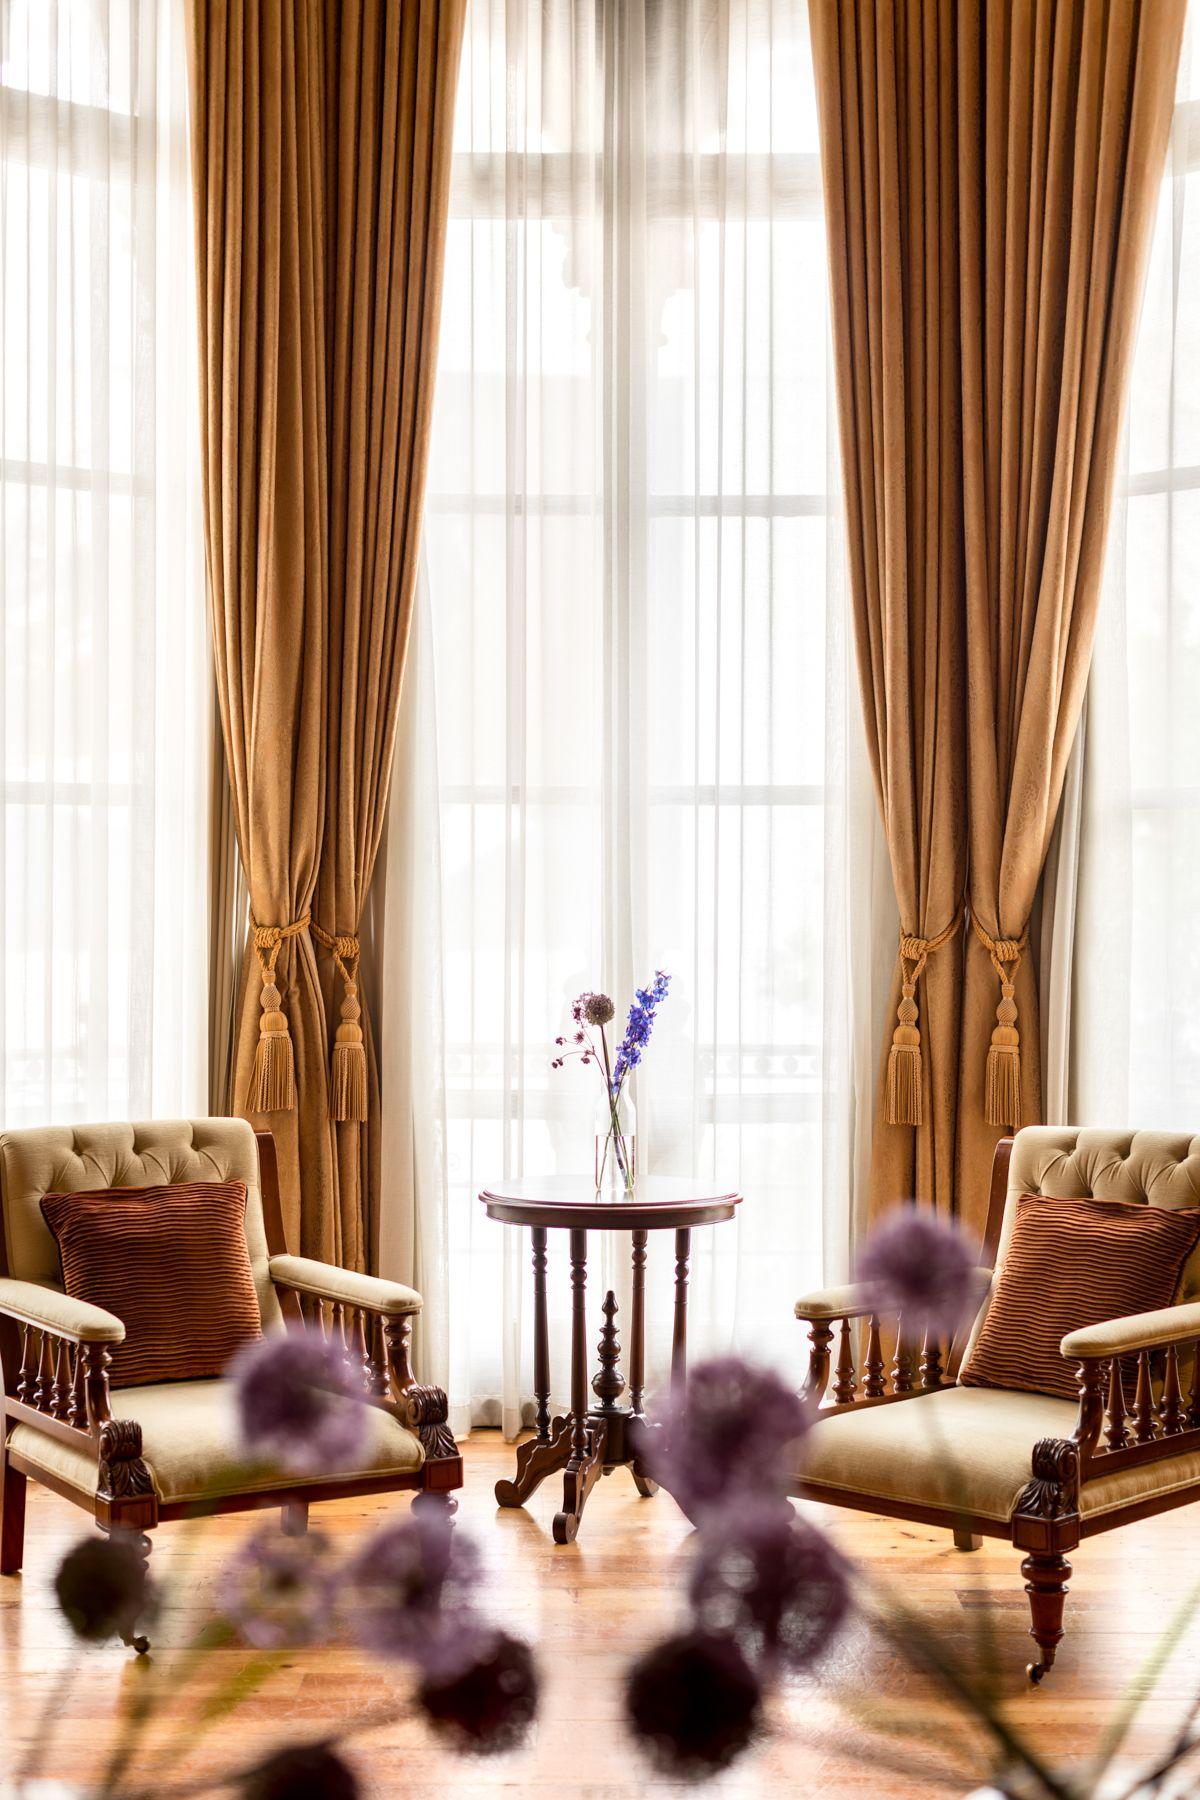 Renaissance St. Pancras Hotel